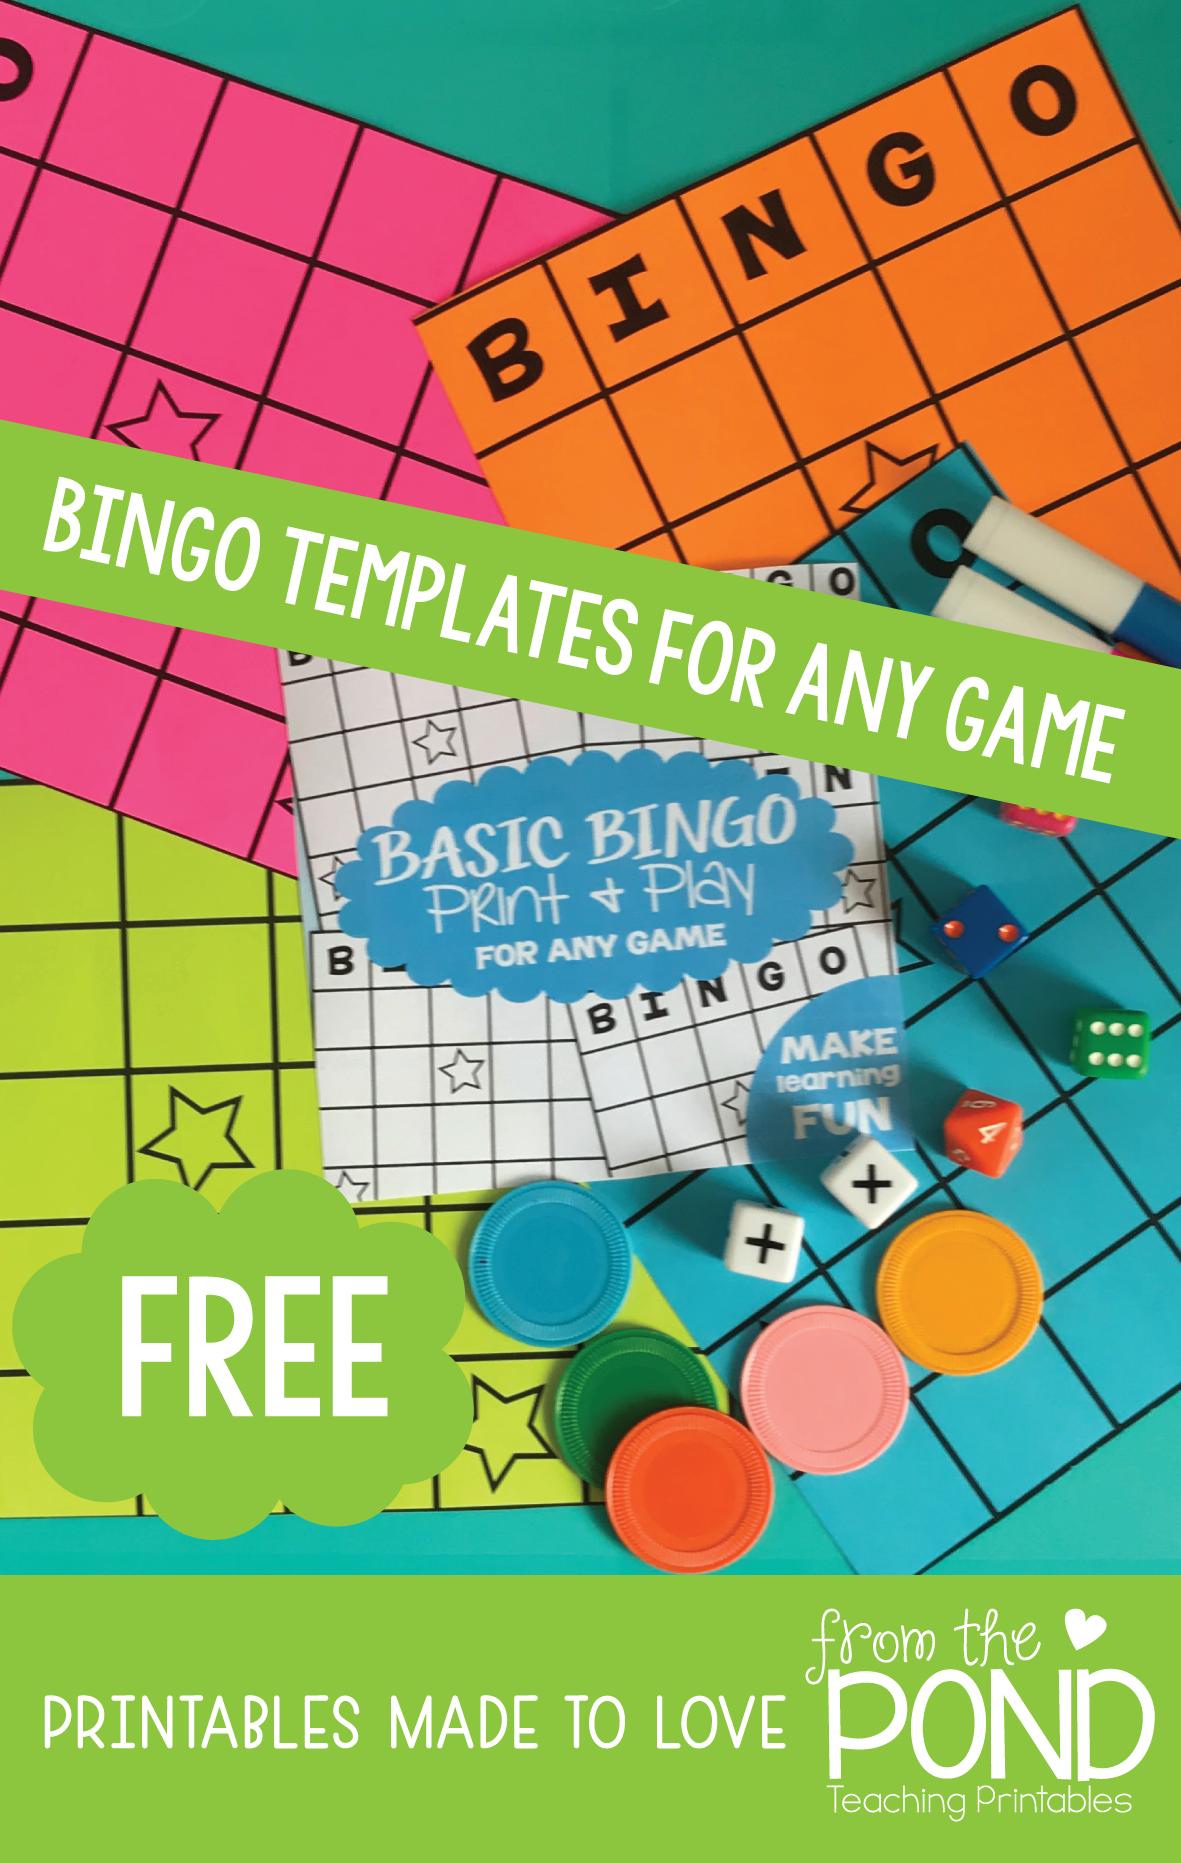 Free Printable Bingo Board Templates For Classroom Games